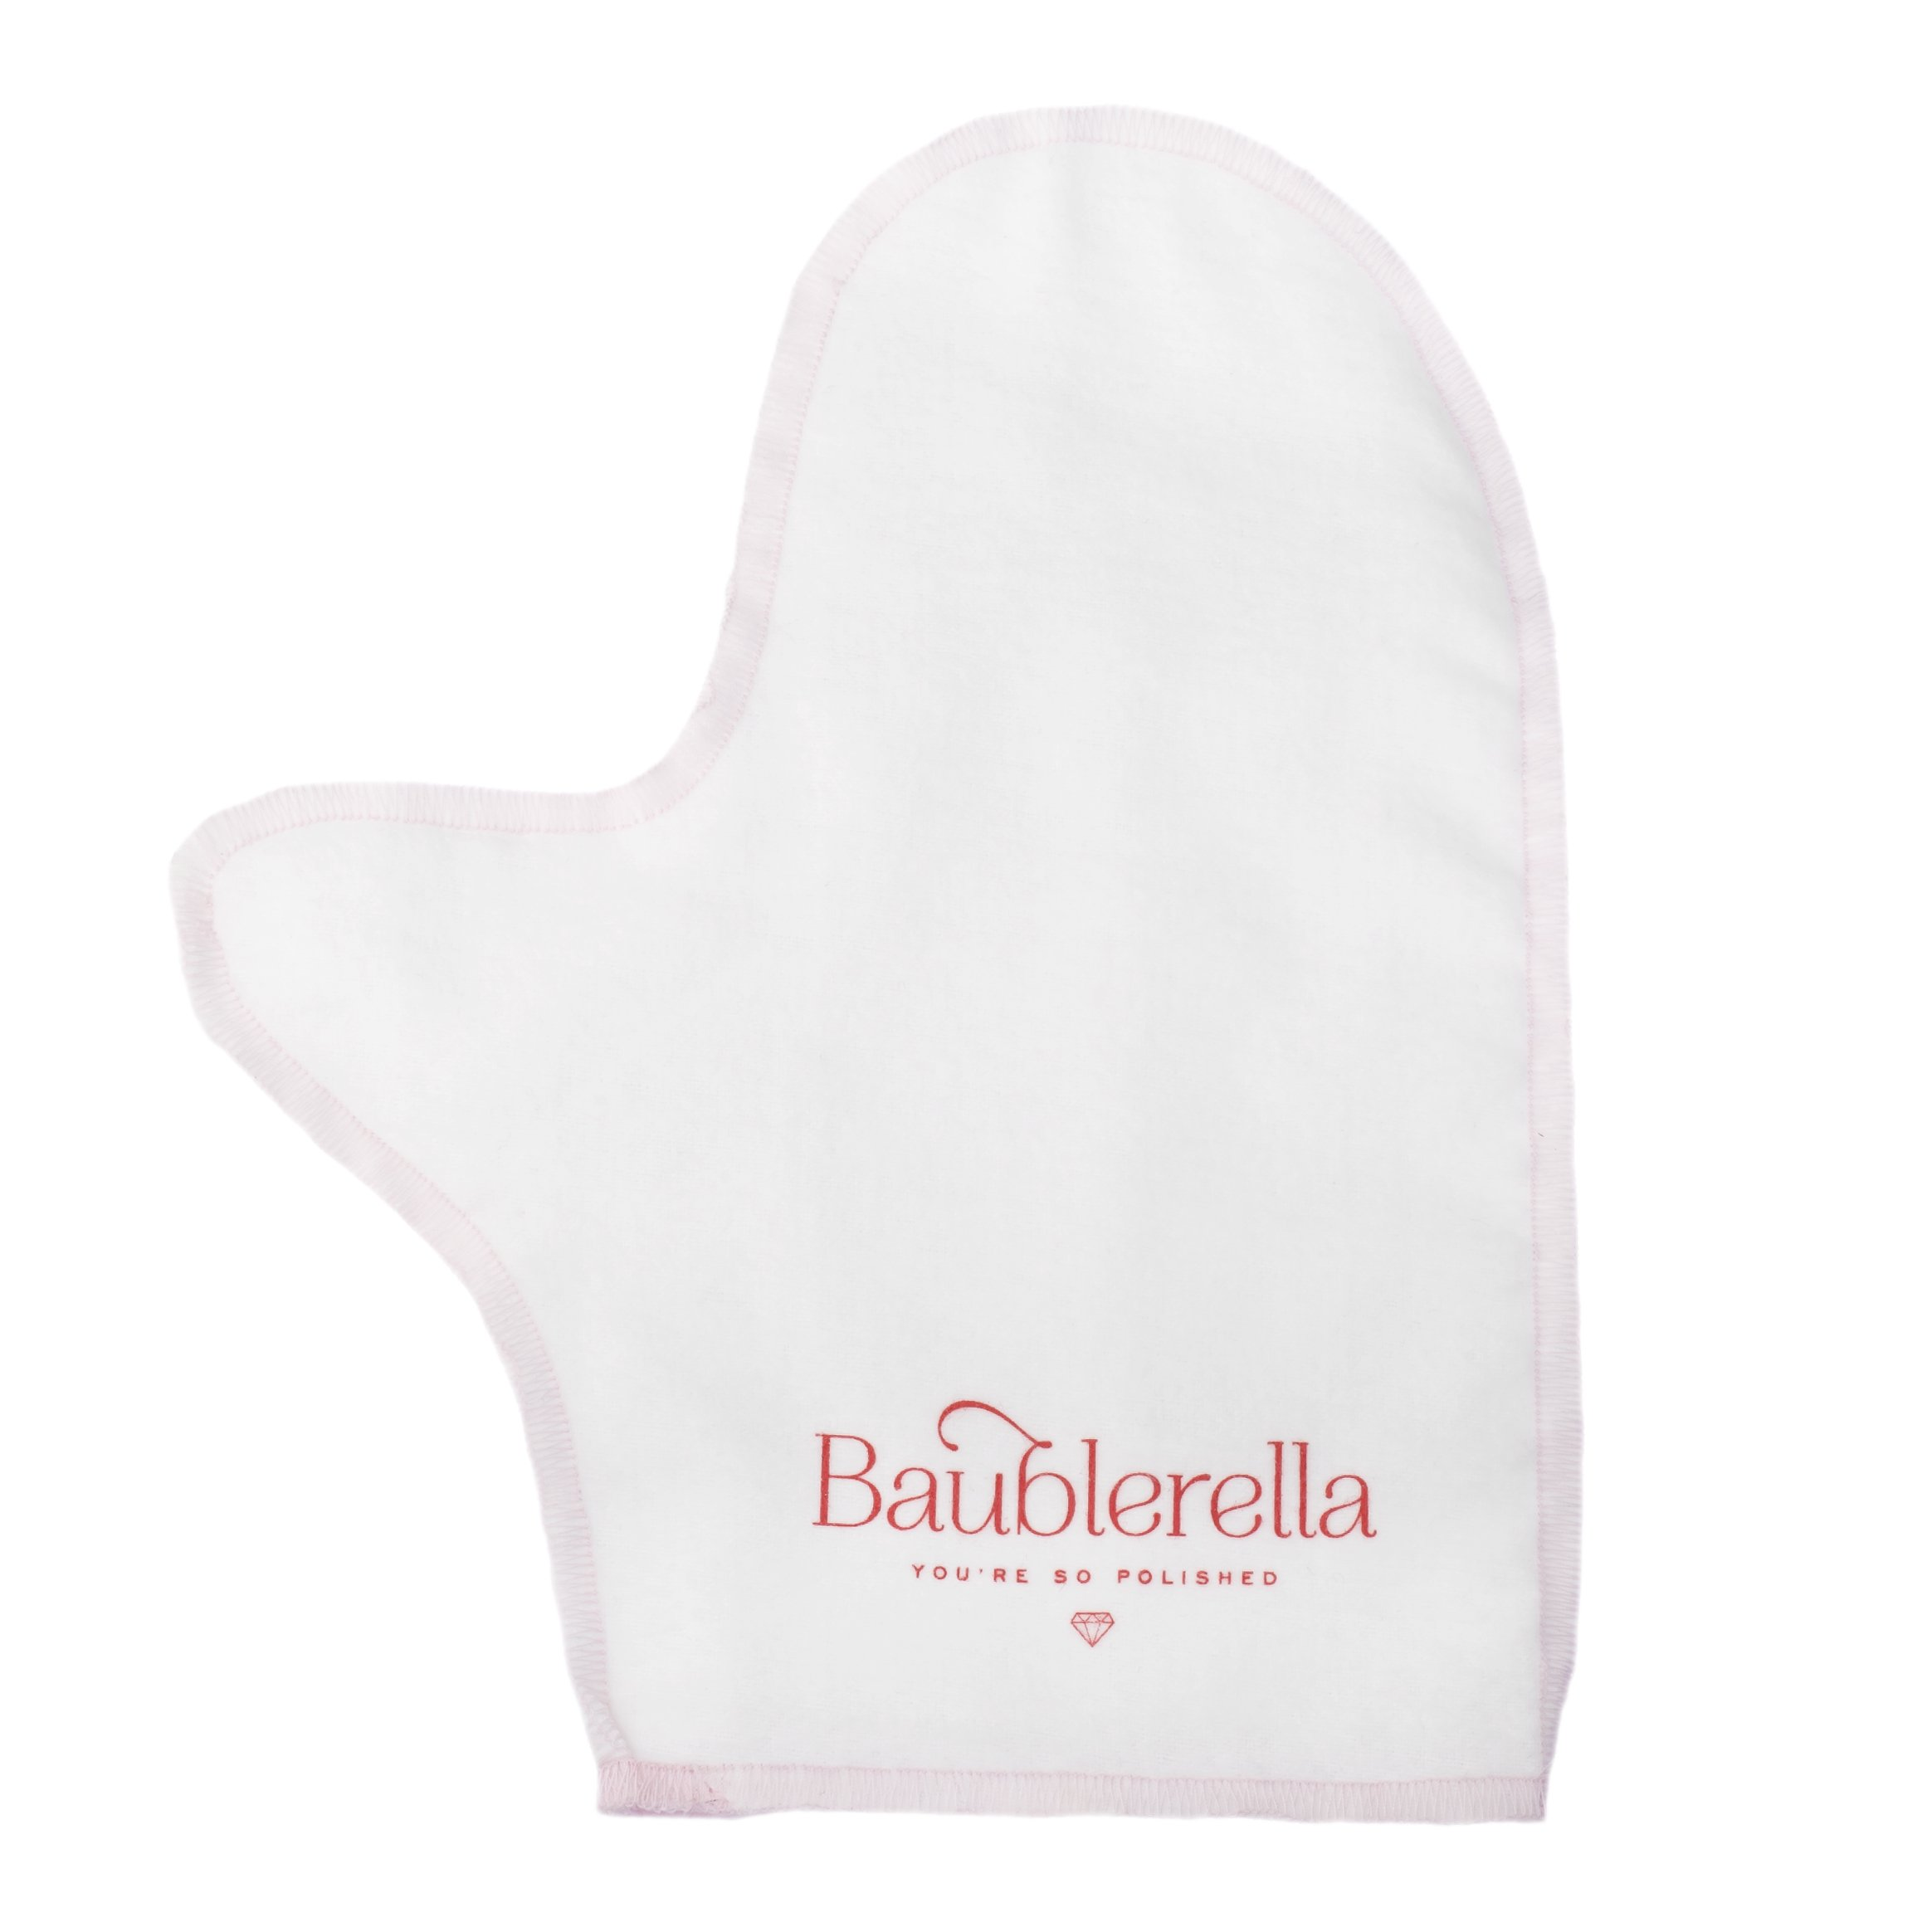 Baublerella Glitzy Glove Jewelry Polishing Cloth